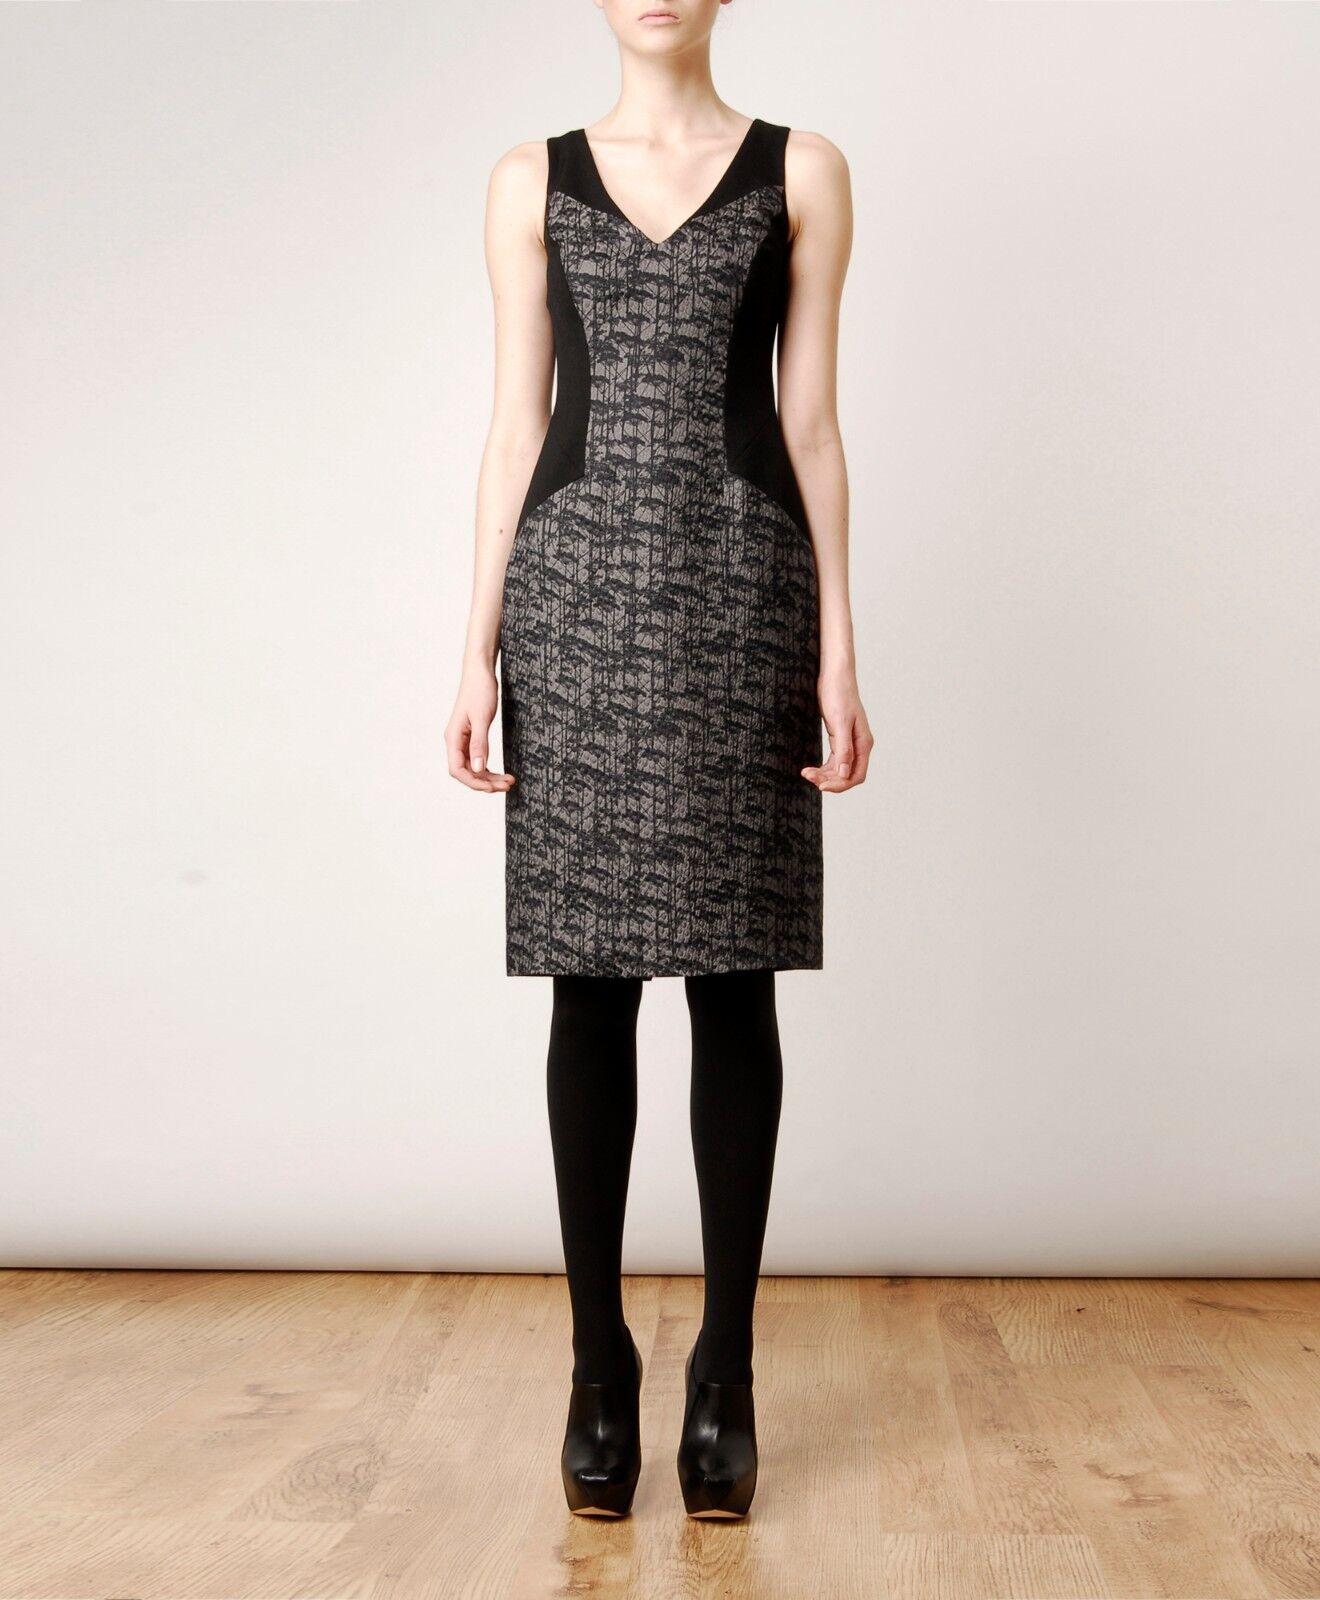 JASON WU Silk Wool Tree Jacquard Jacquard Jacquard Dress Size 4 NEW  2,070 ee82bd